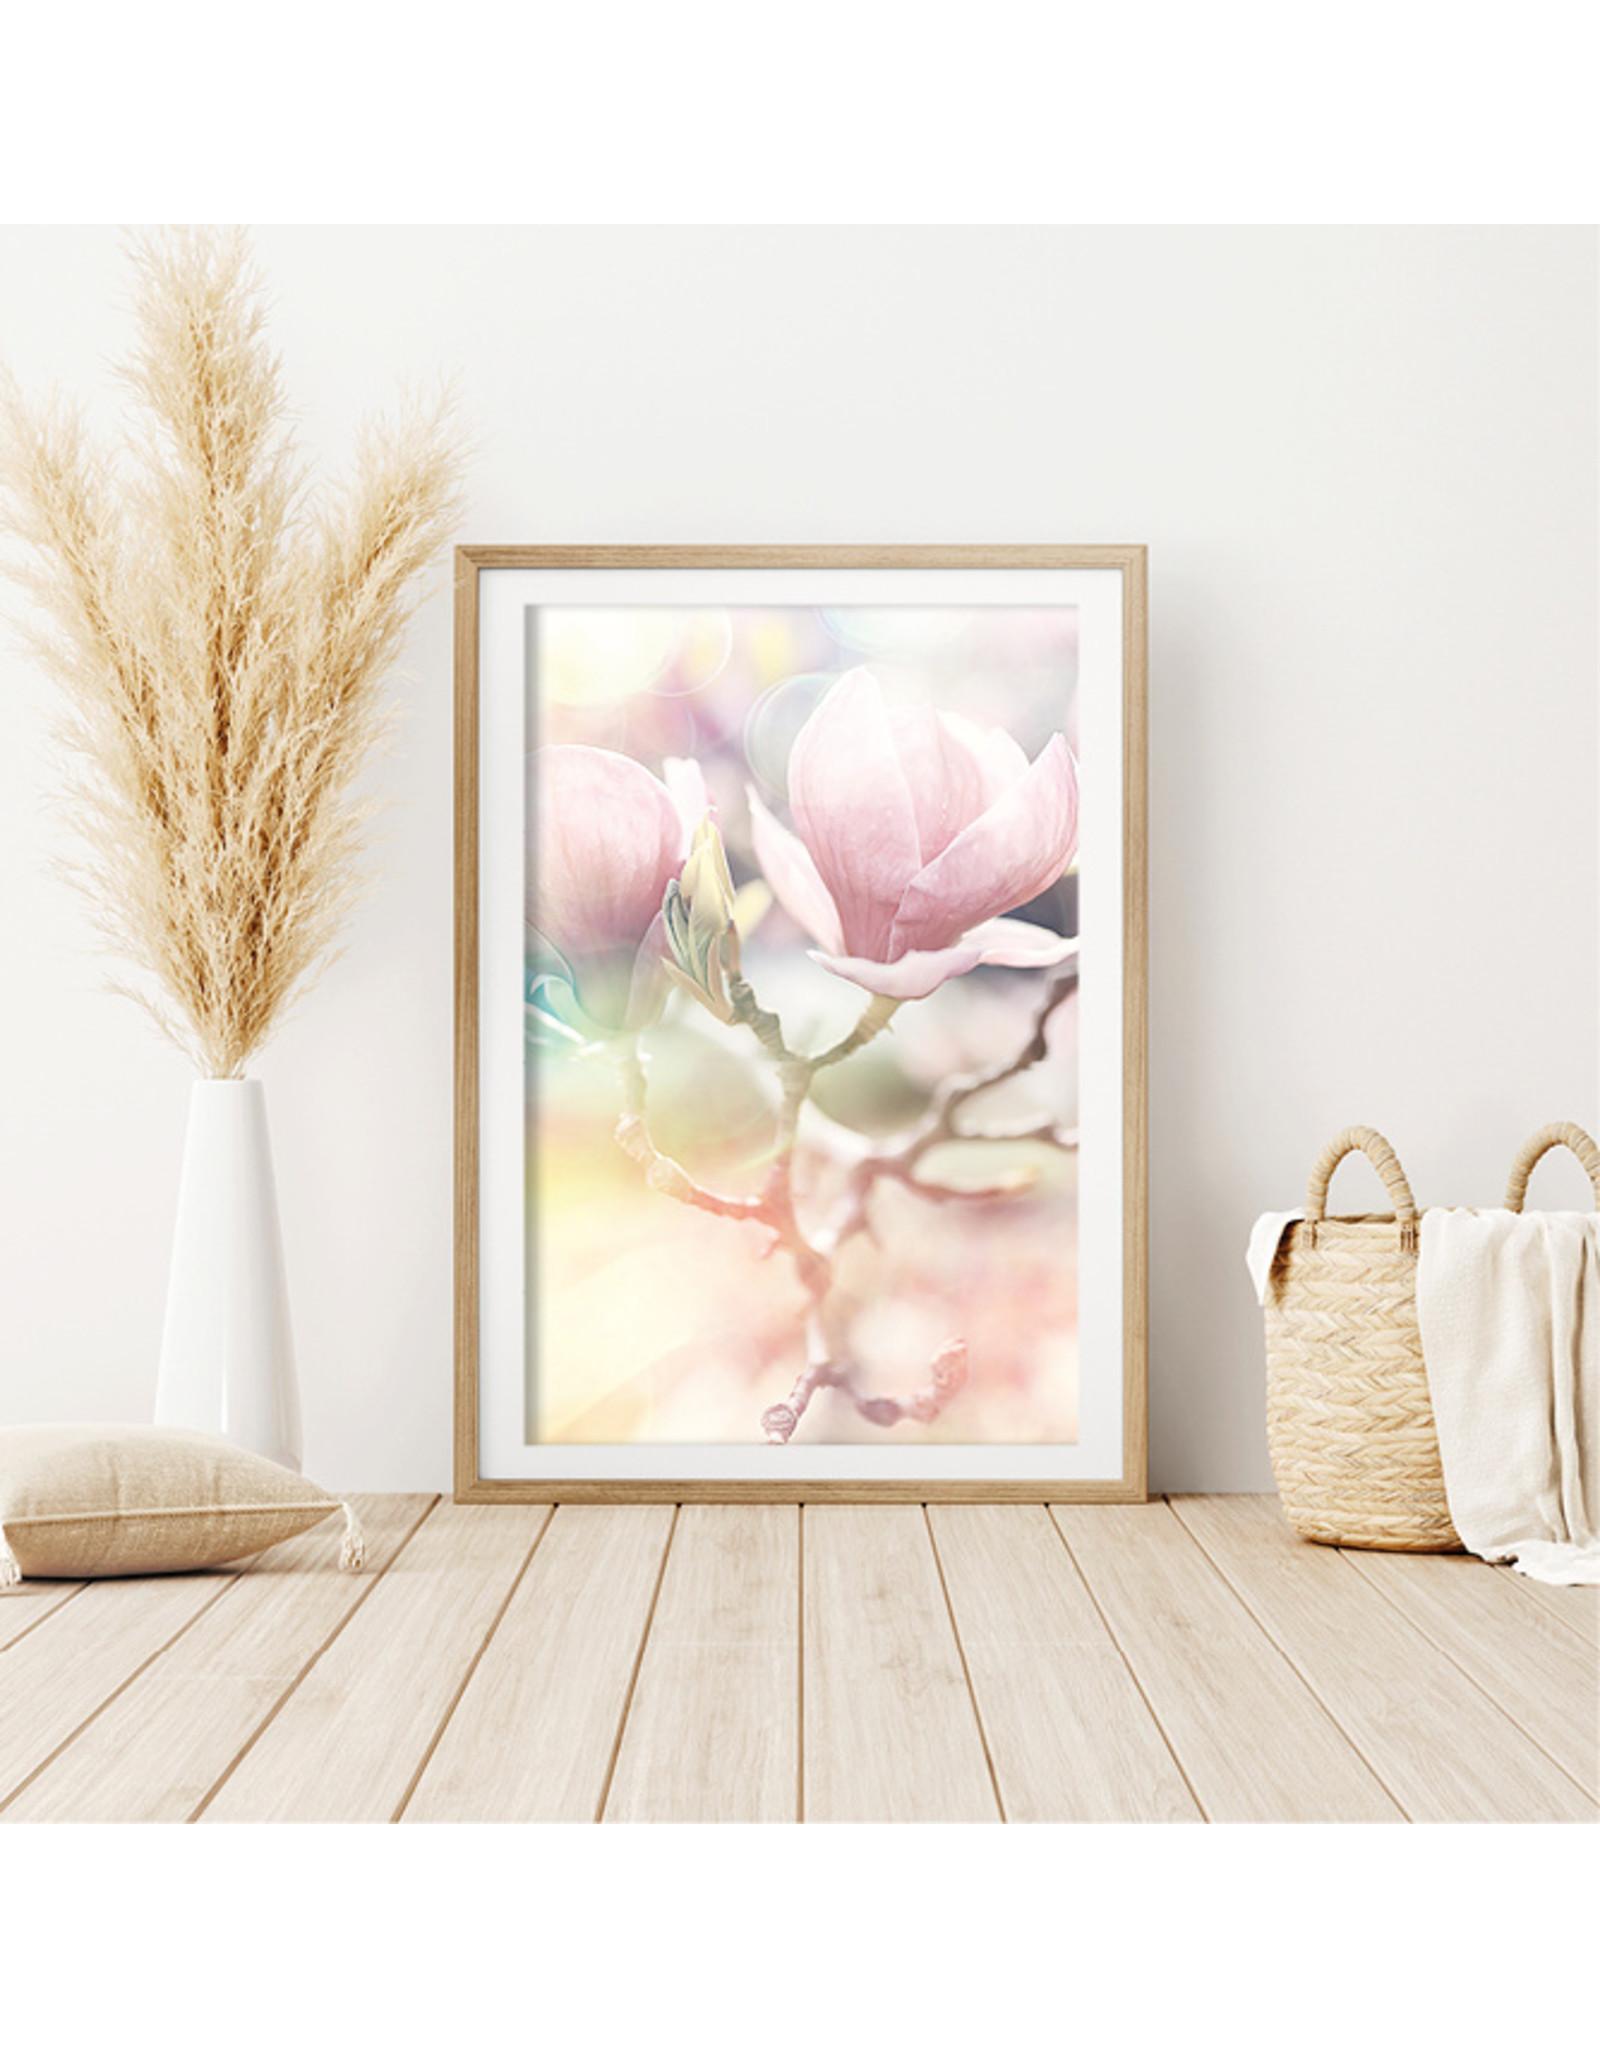 Dunnebier Home Poster Magnolia